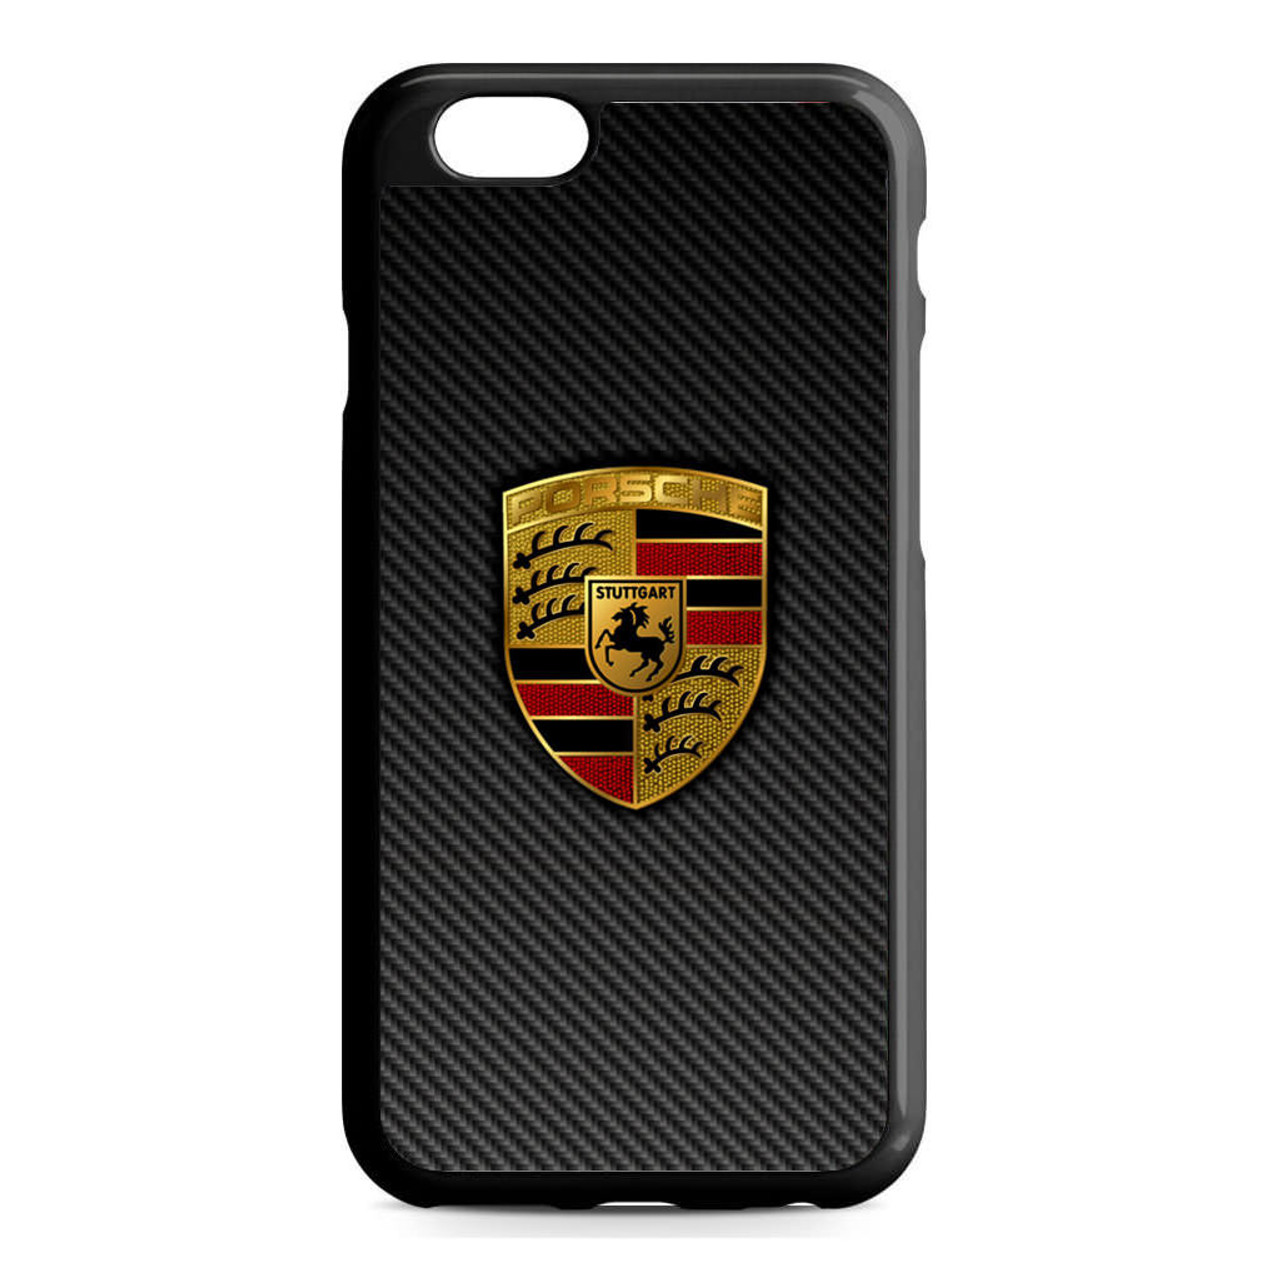 porsche iphone 6s case